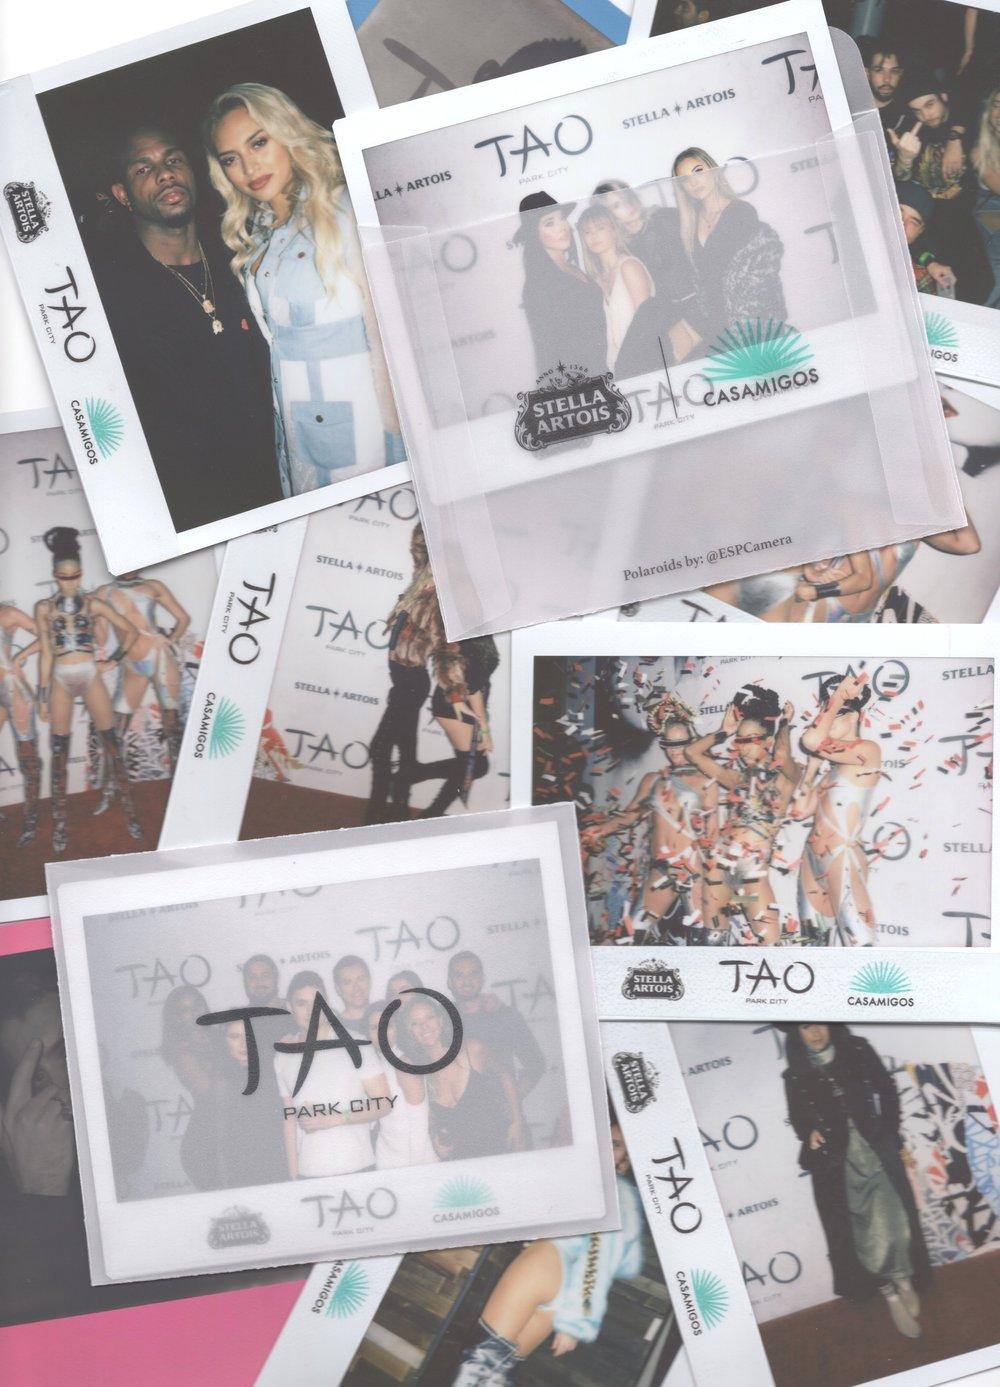 Tao Group | Casamigos | Stella